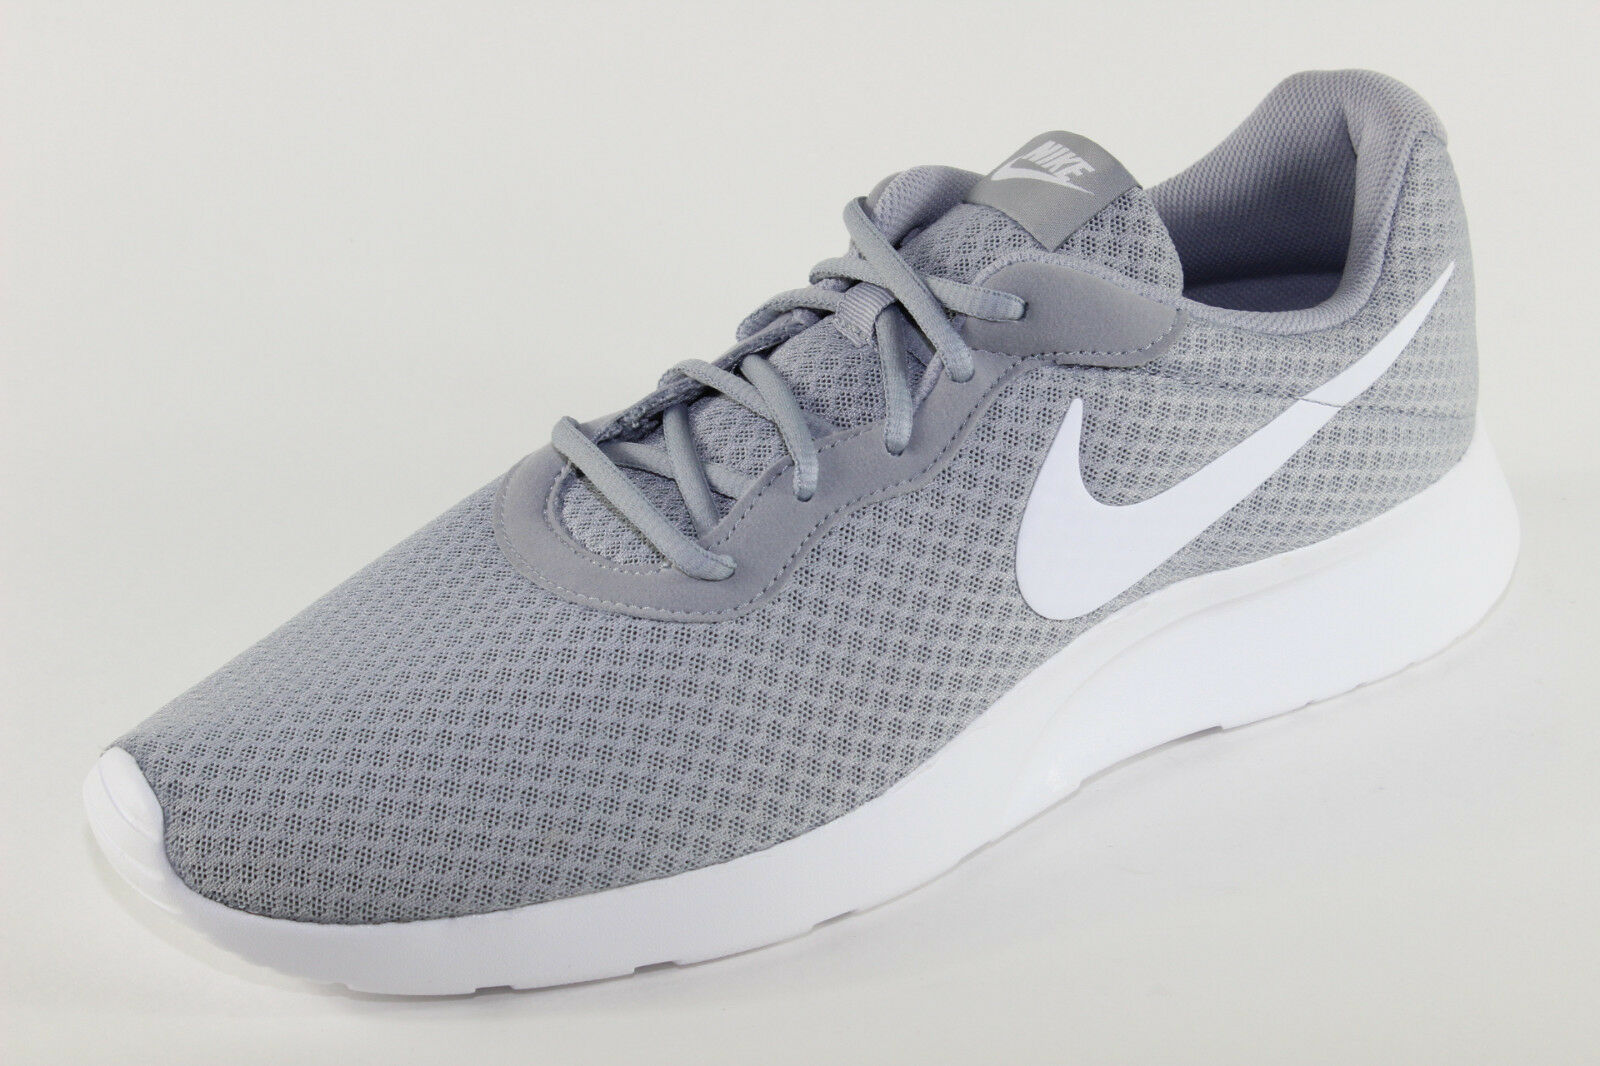 Nike Tanjun, leichte Sport-Turnschuhe, Grau   Weiß, Herrenschuhe Übergröße